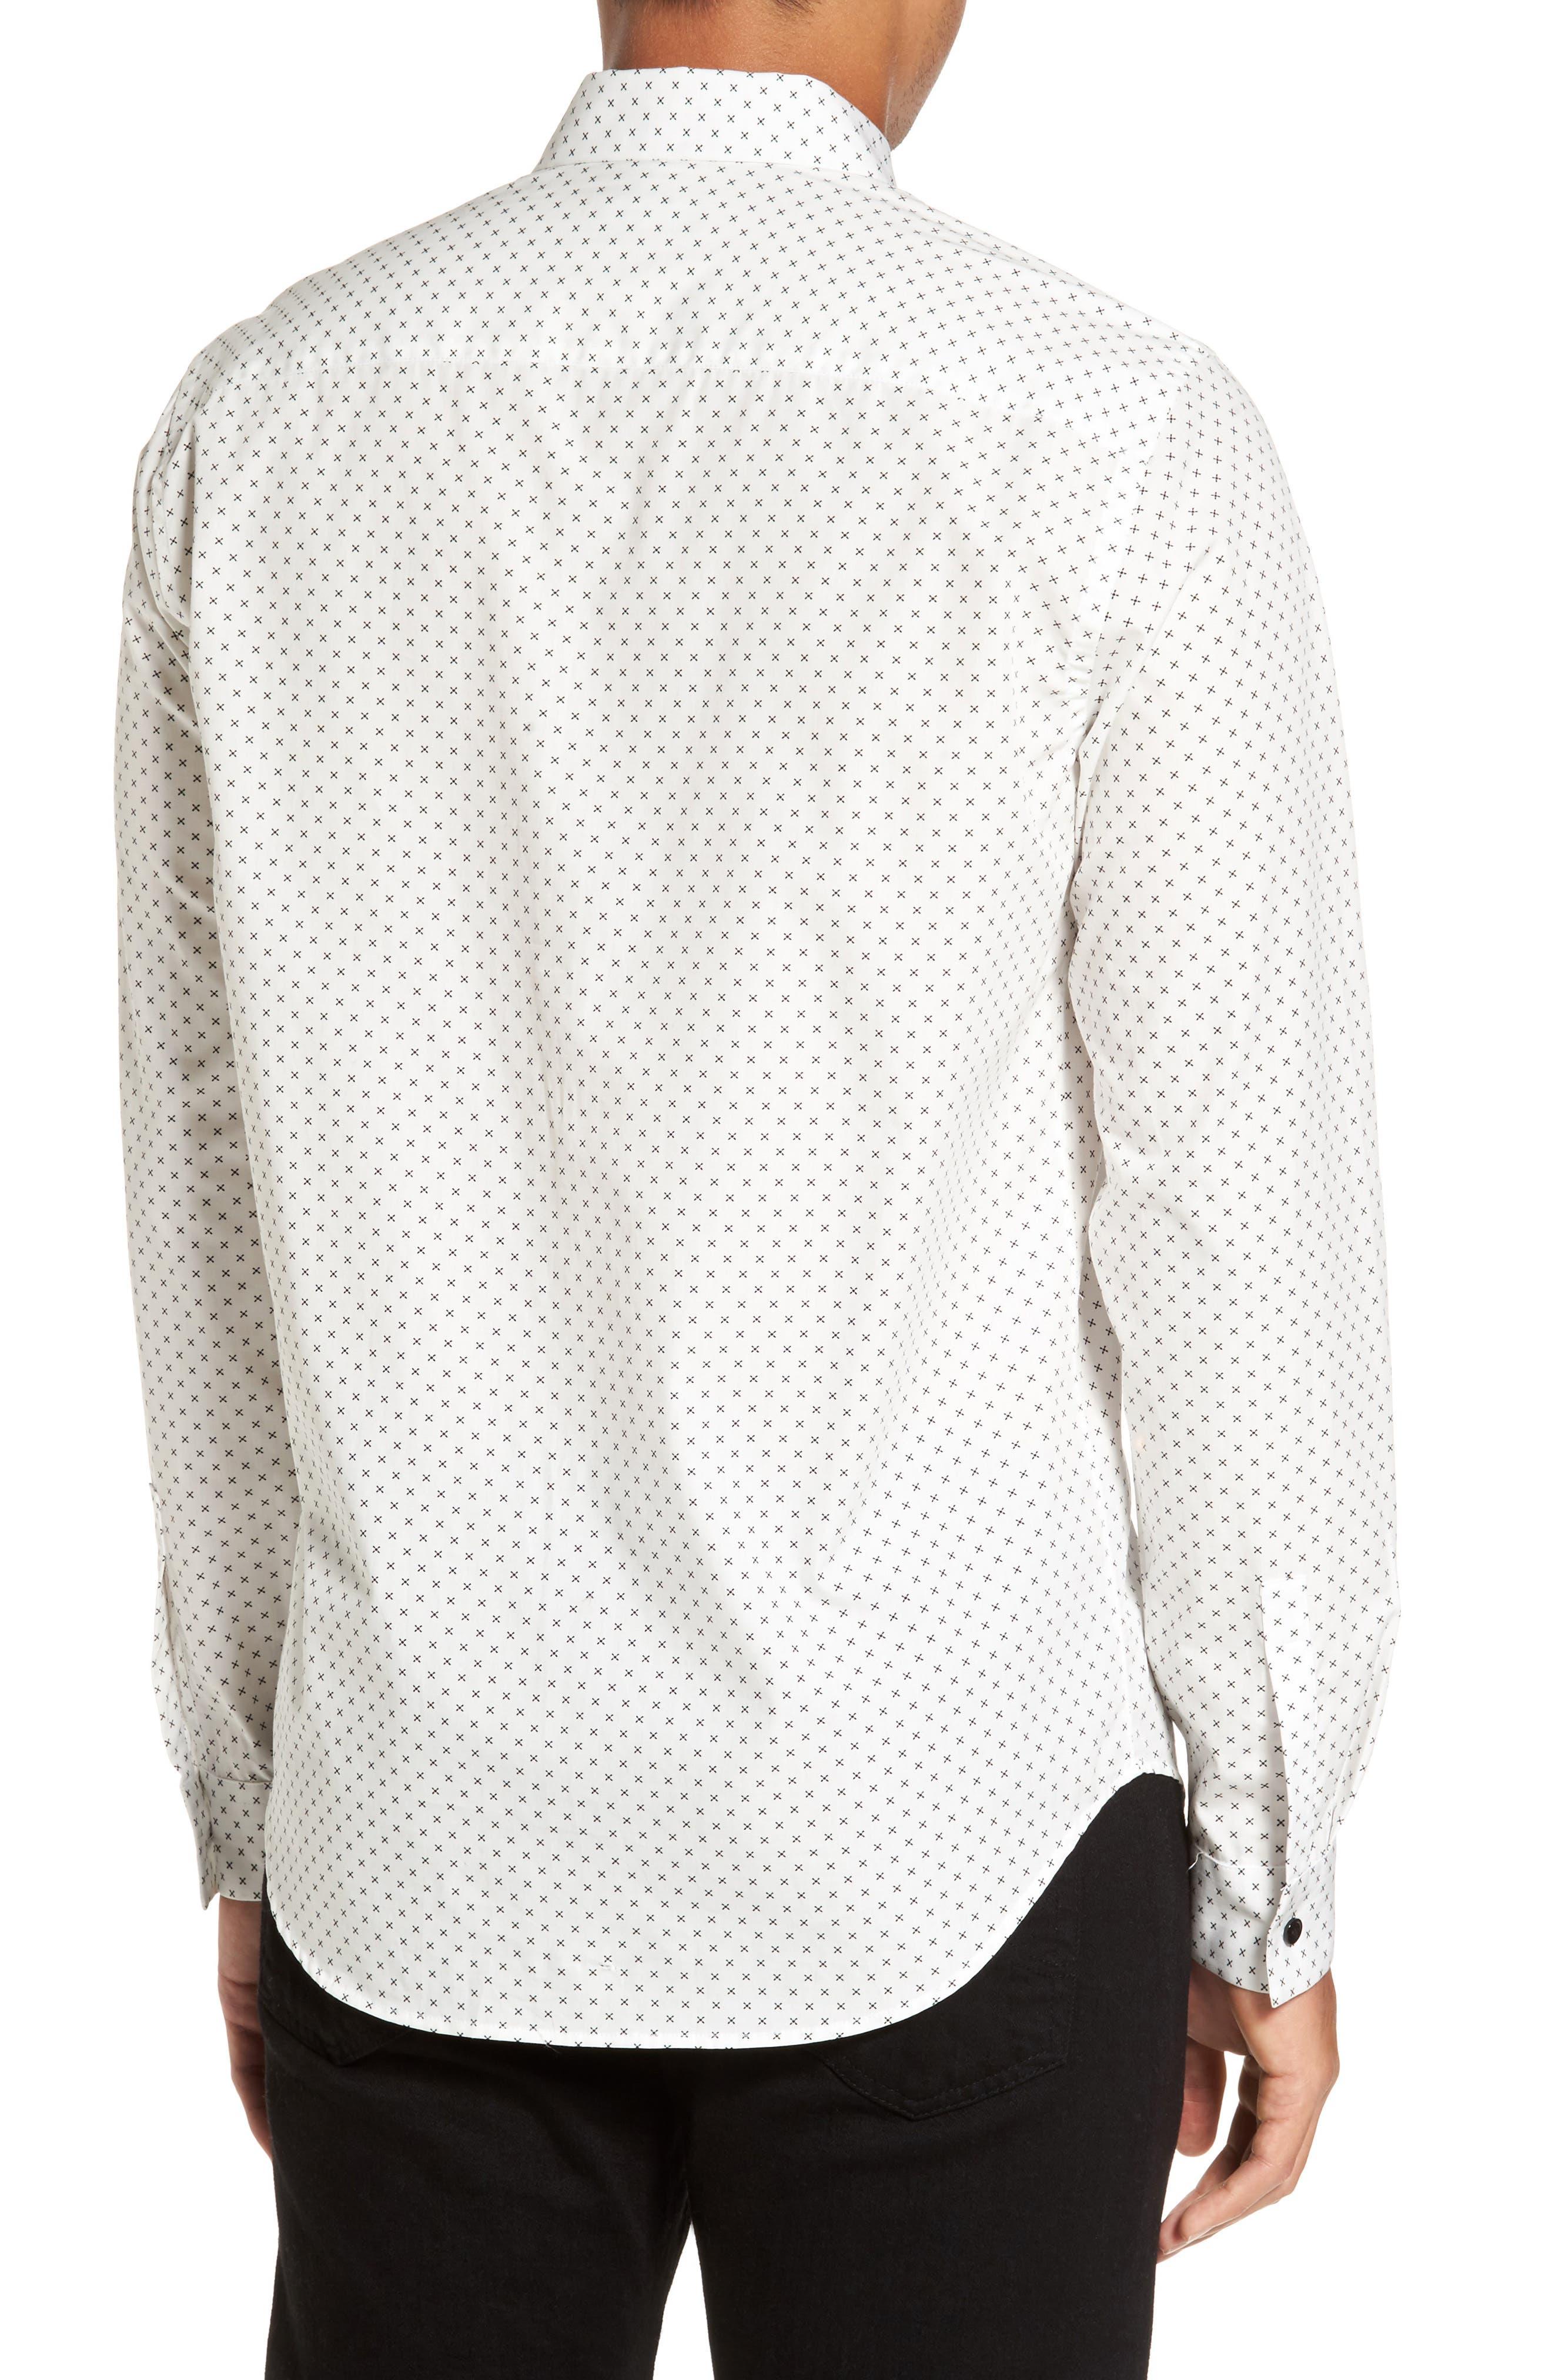 Stitch Print Sport Shirt,                             Alternate thumbnail 2, color,                             Ivory Multi